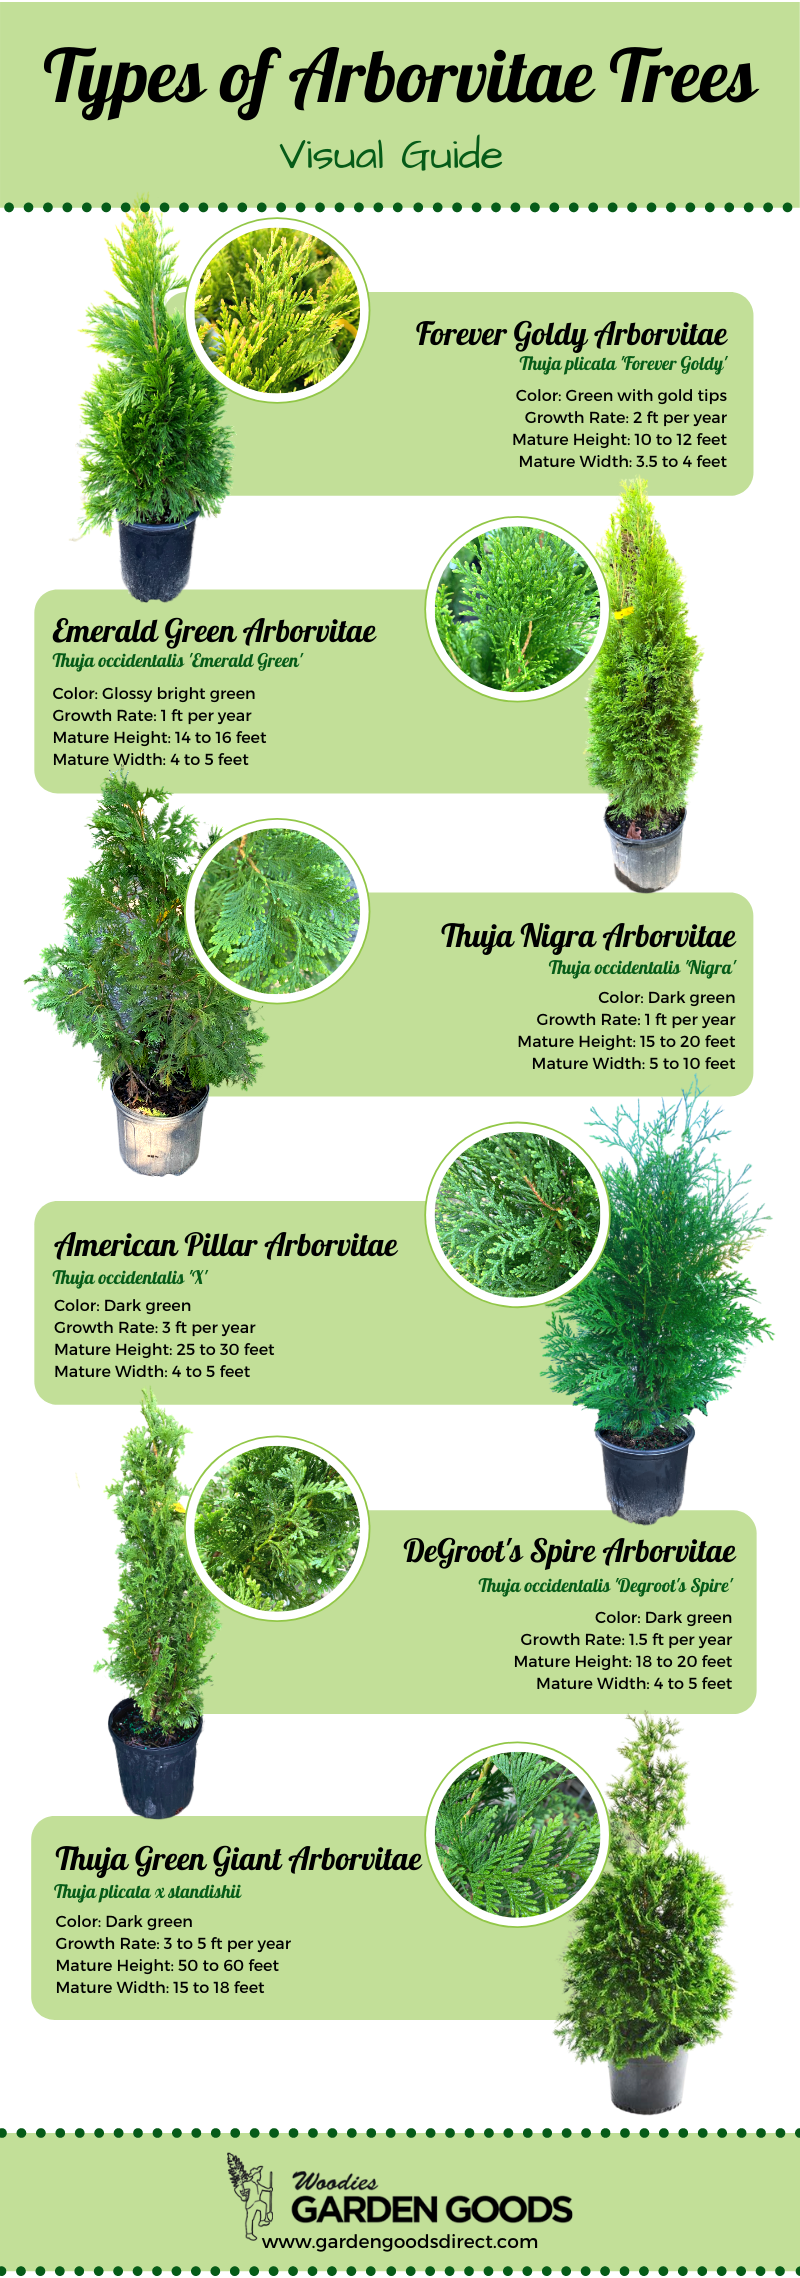 types of arborvitae trees visual guide